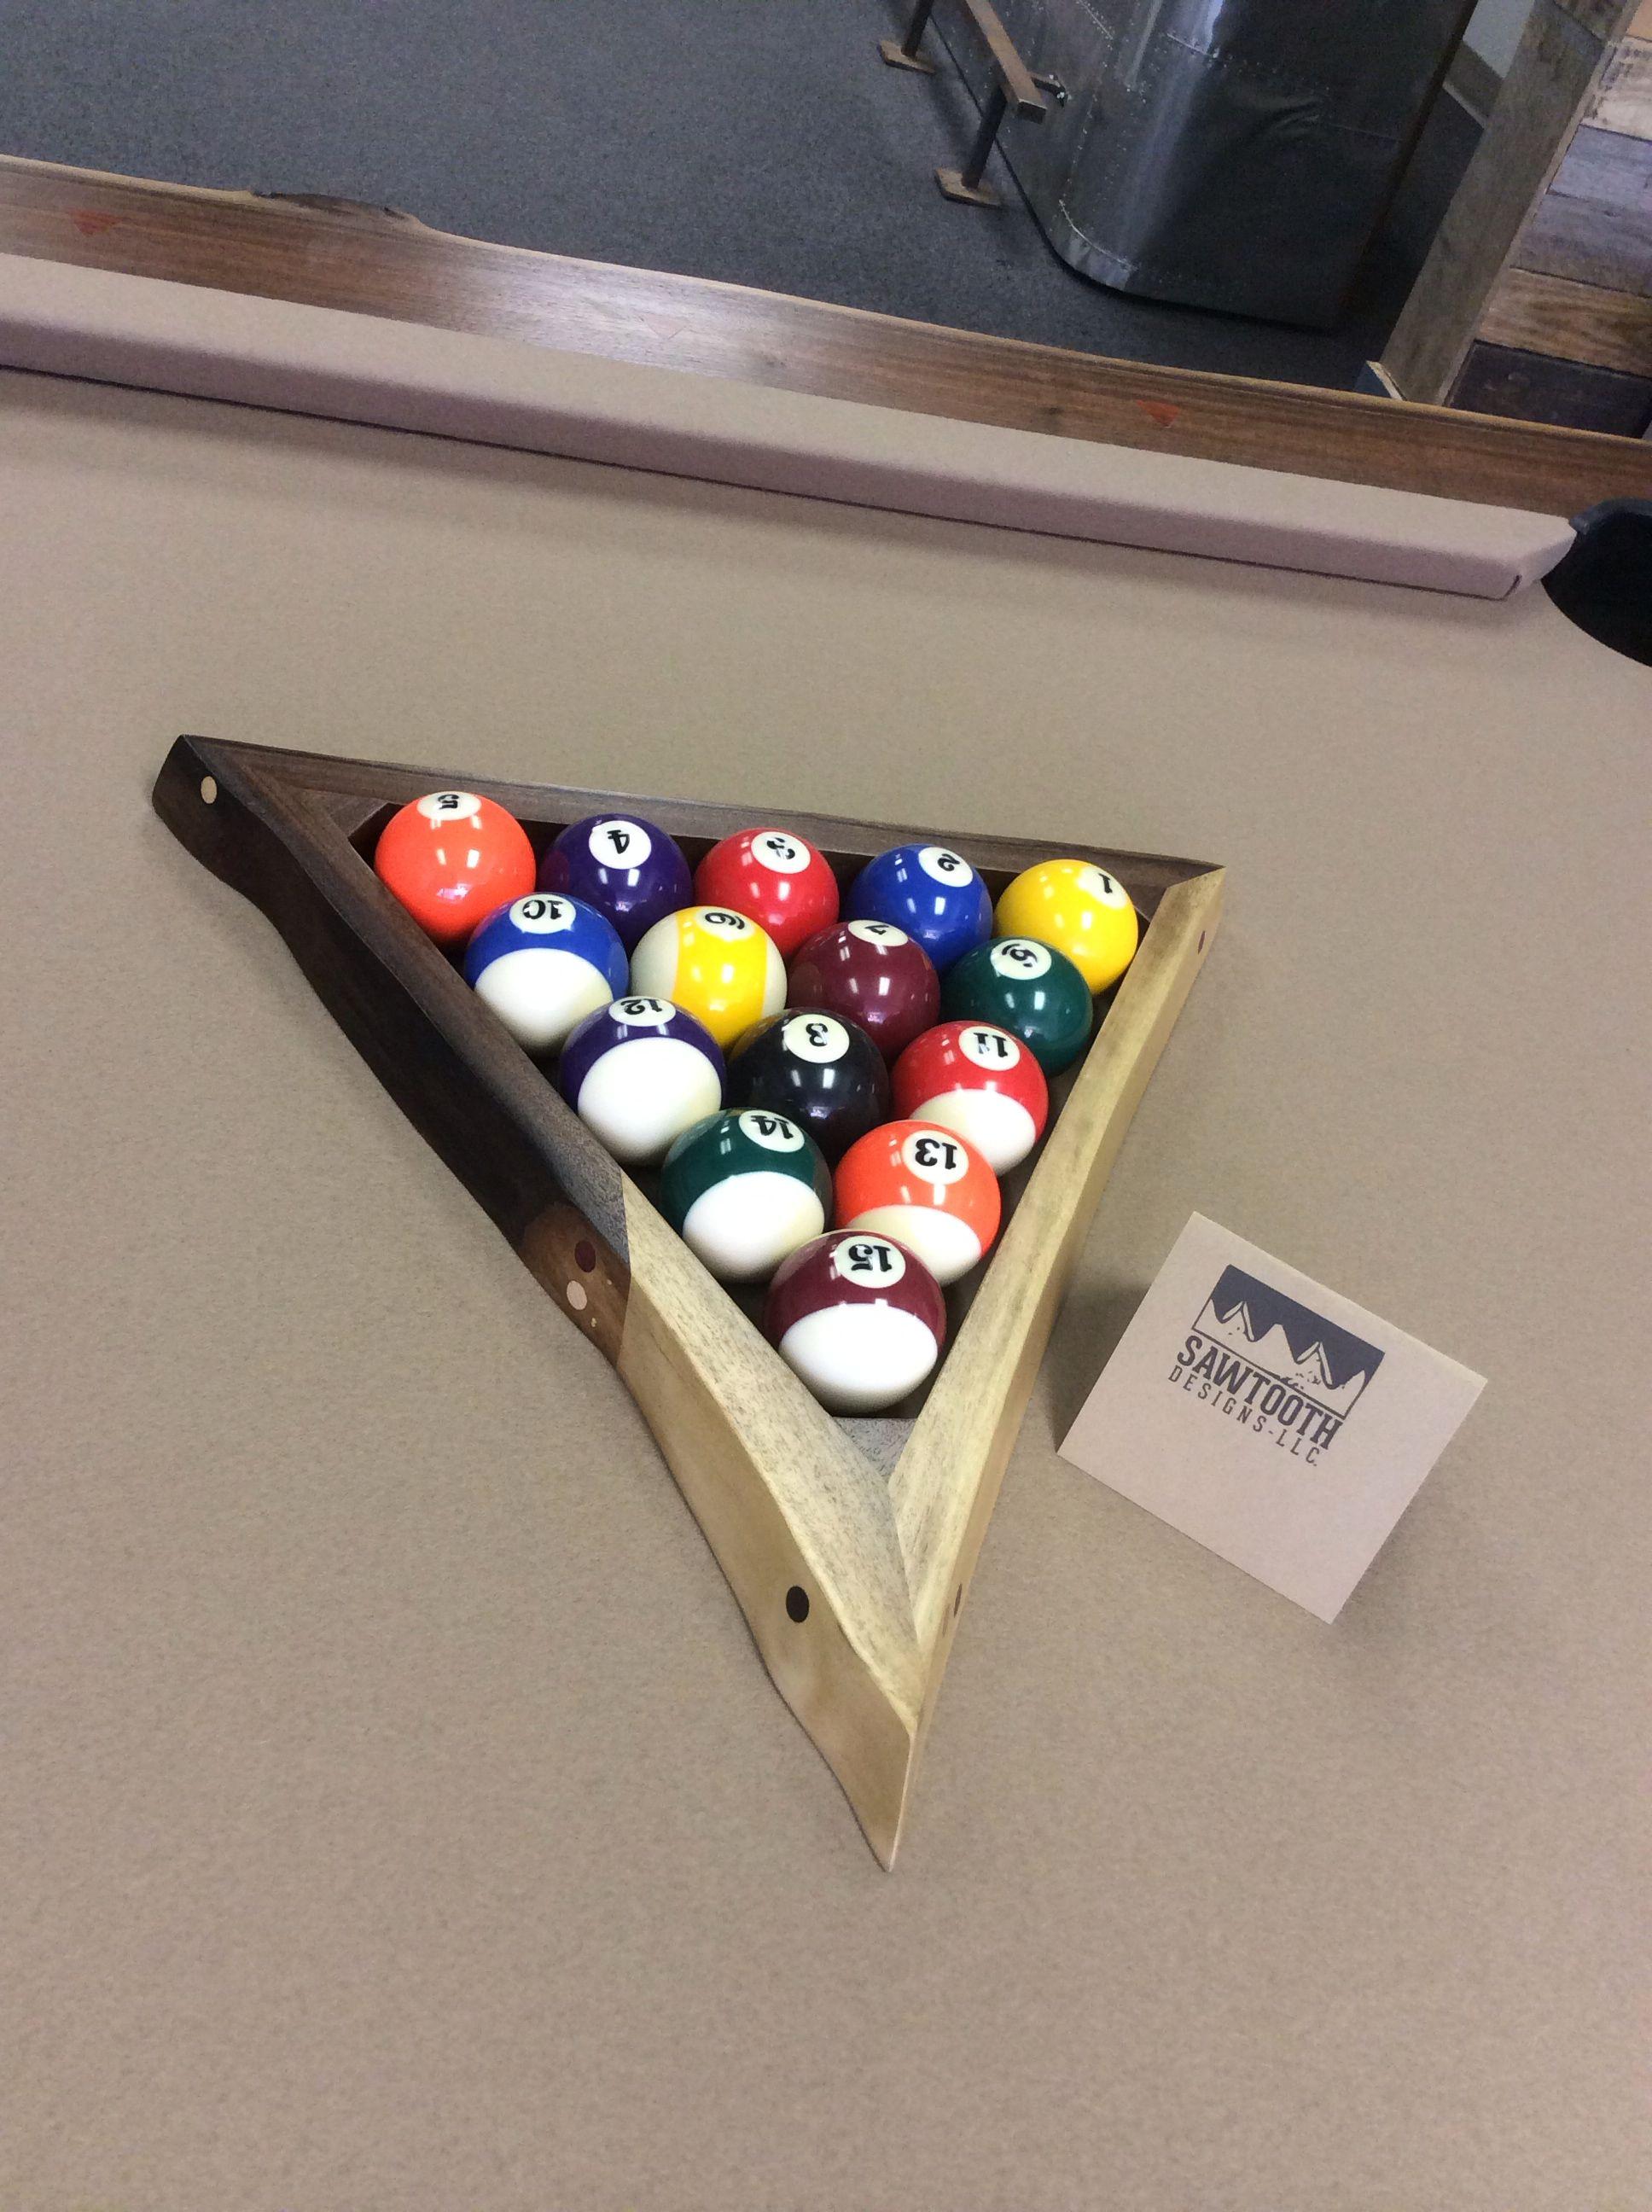 Live Edge Wood Ball Rack For Pool Table Custom Made By